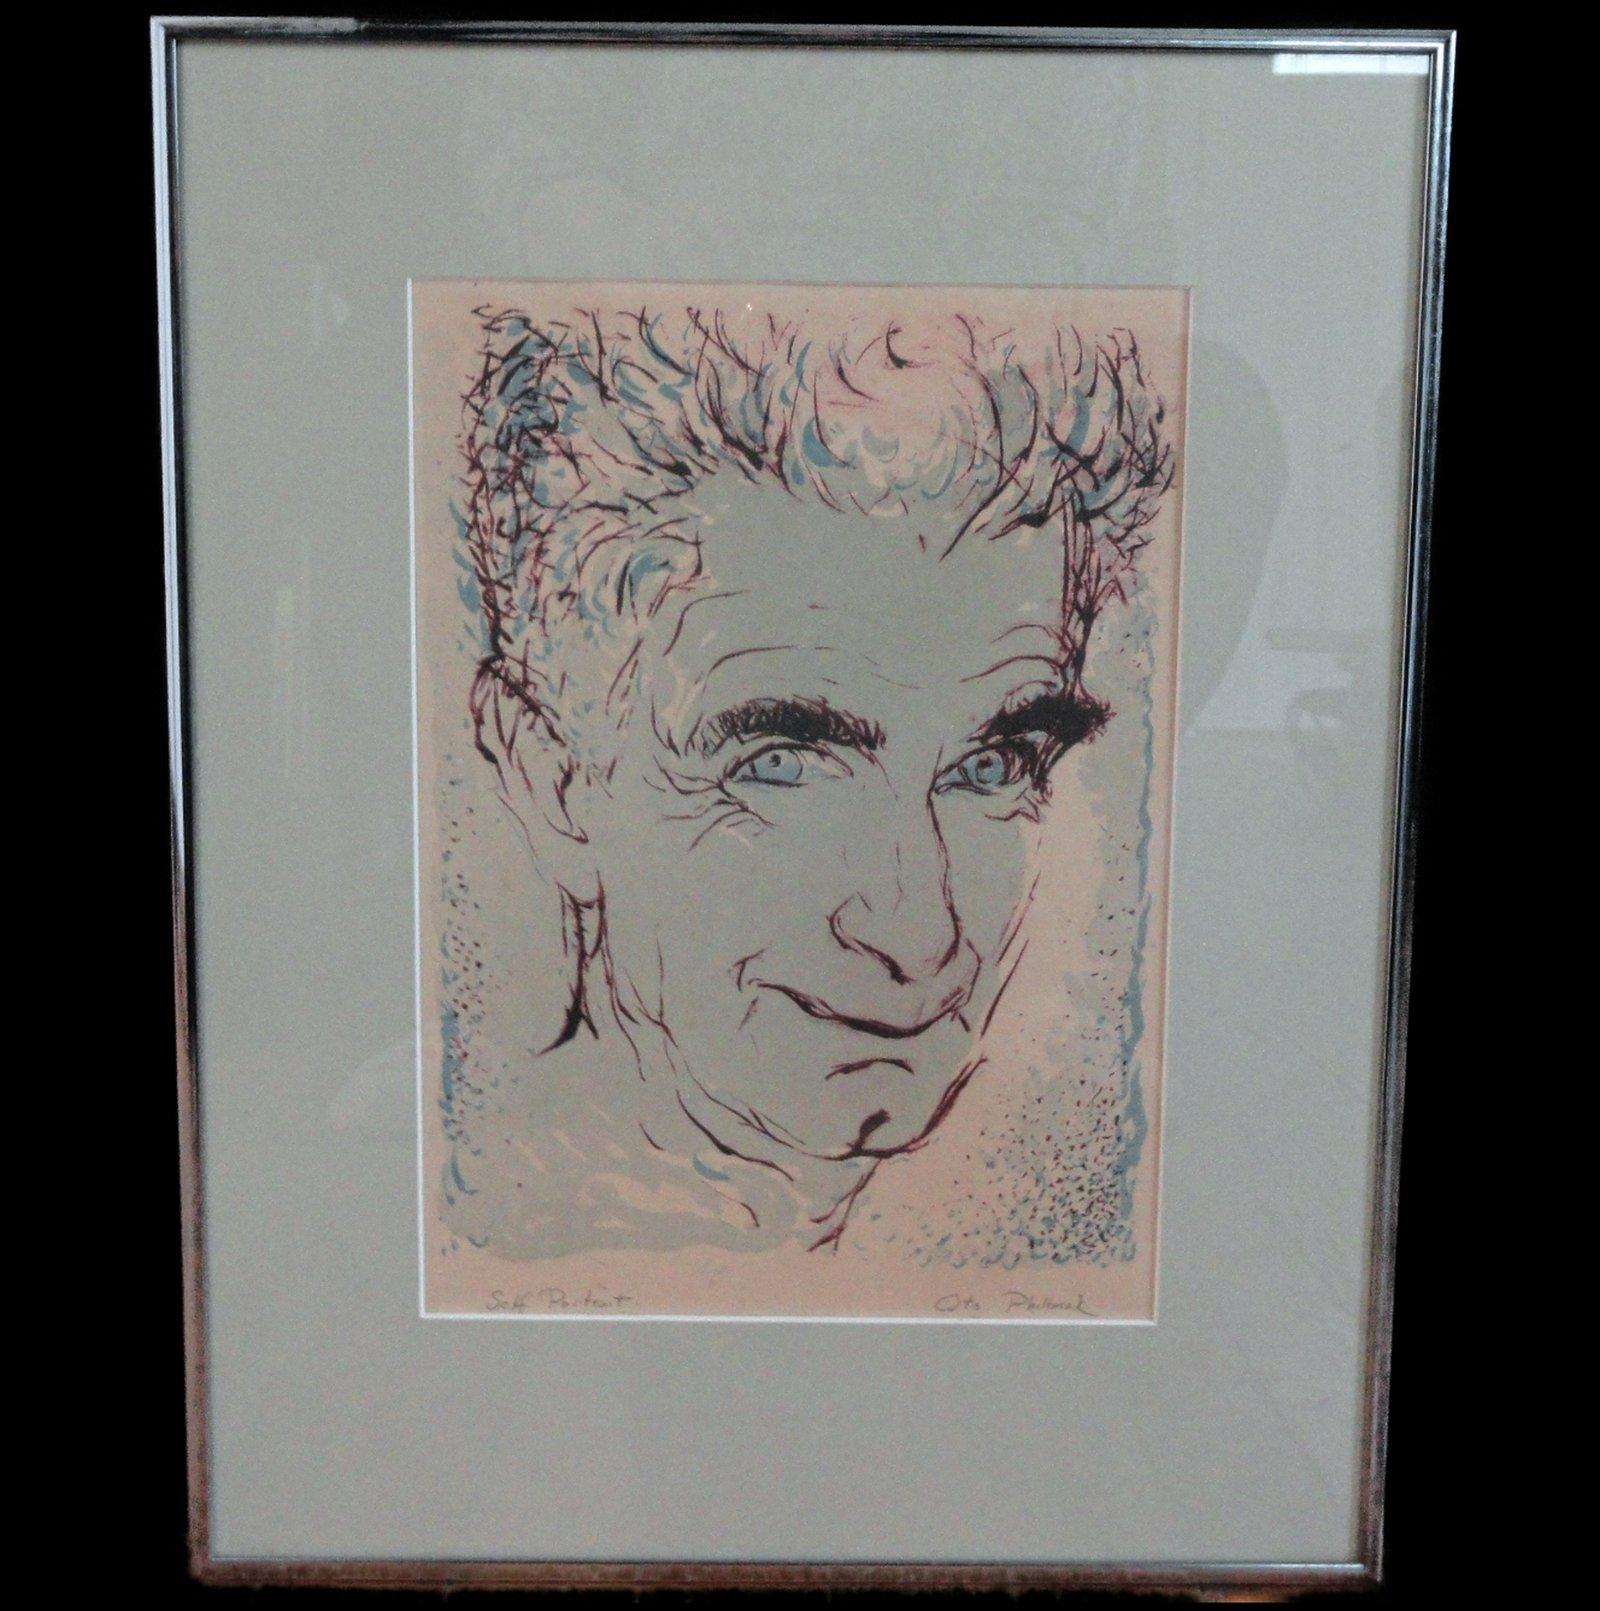 Otis Philbrick, Self Portrait, Woodblock Print, Signed